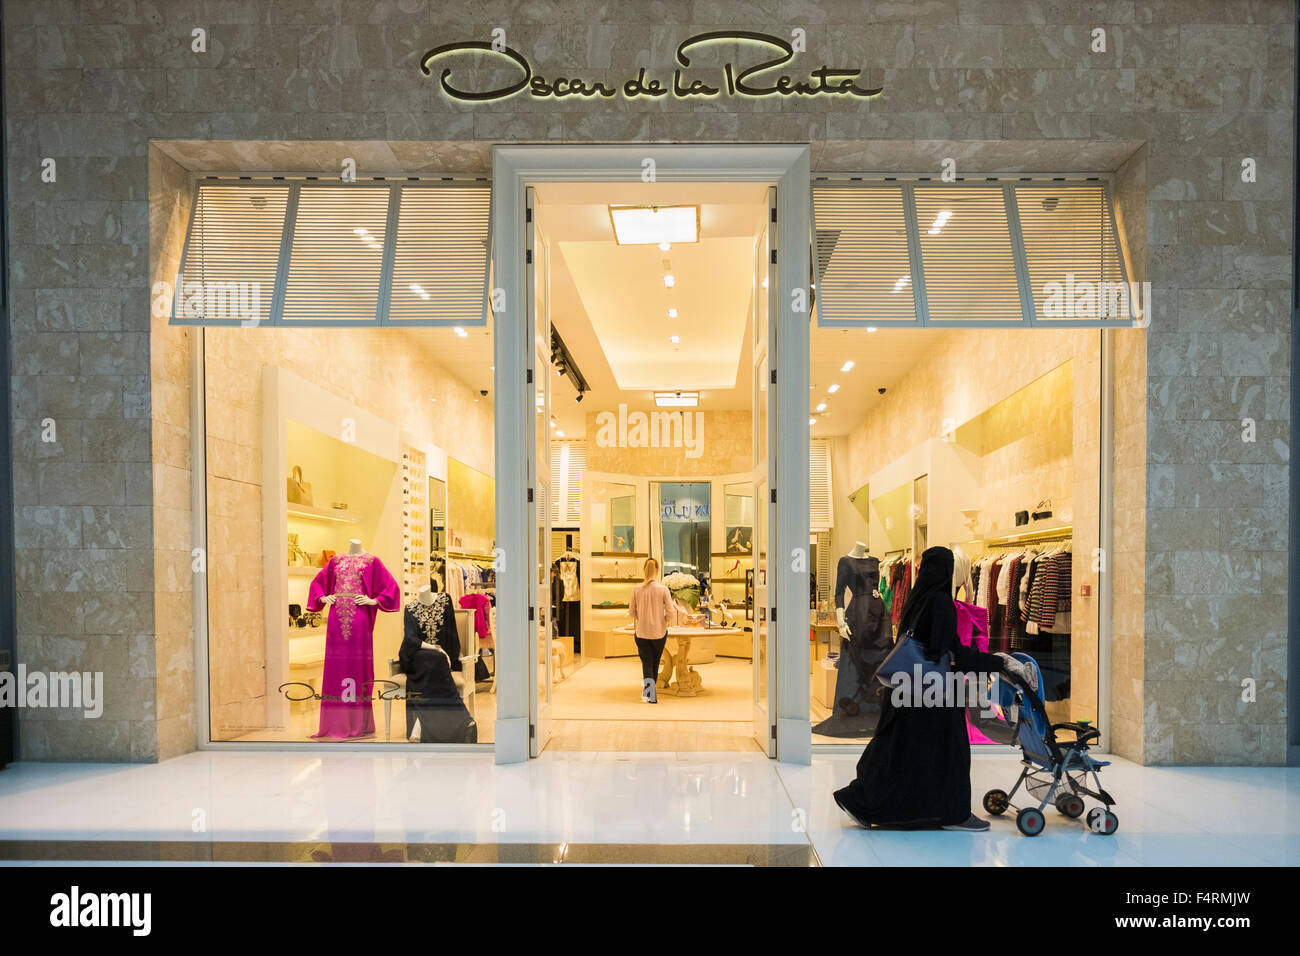 df99dc2f9ccd9d view of Oscar de la Renta fashion boutique inside Dubai Mall in United Arab  Emirates -